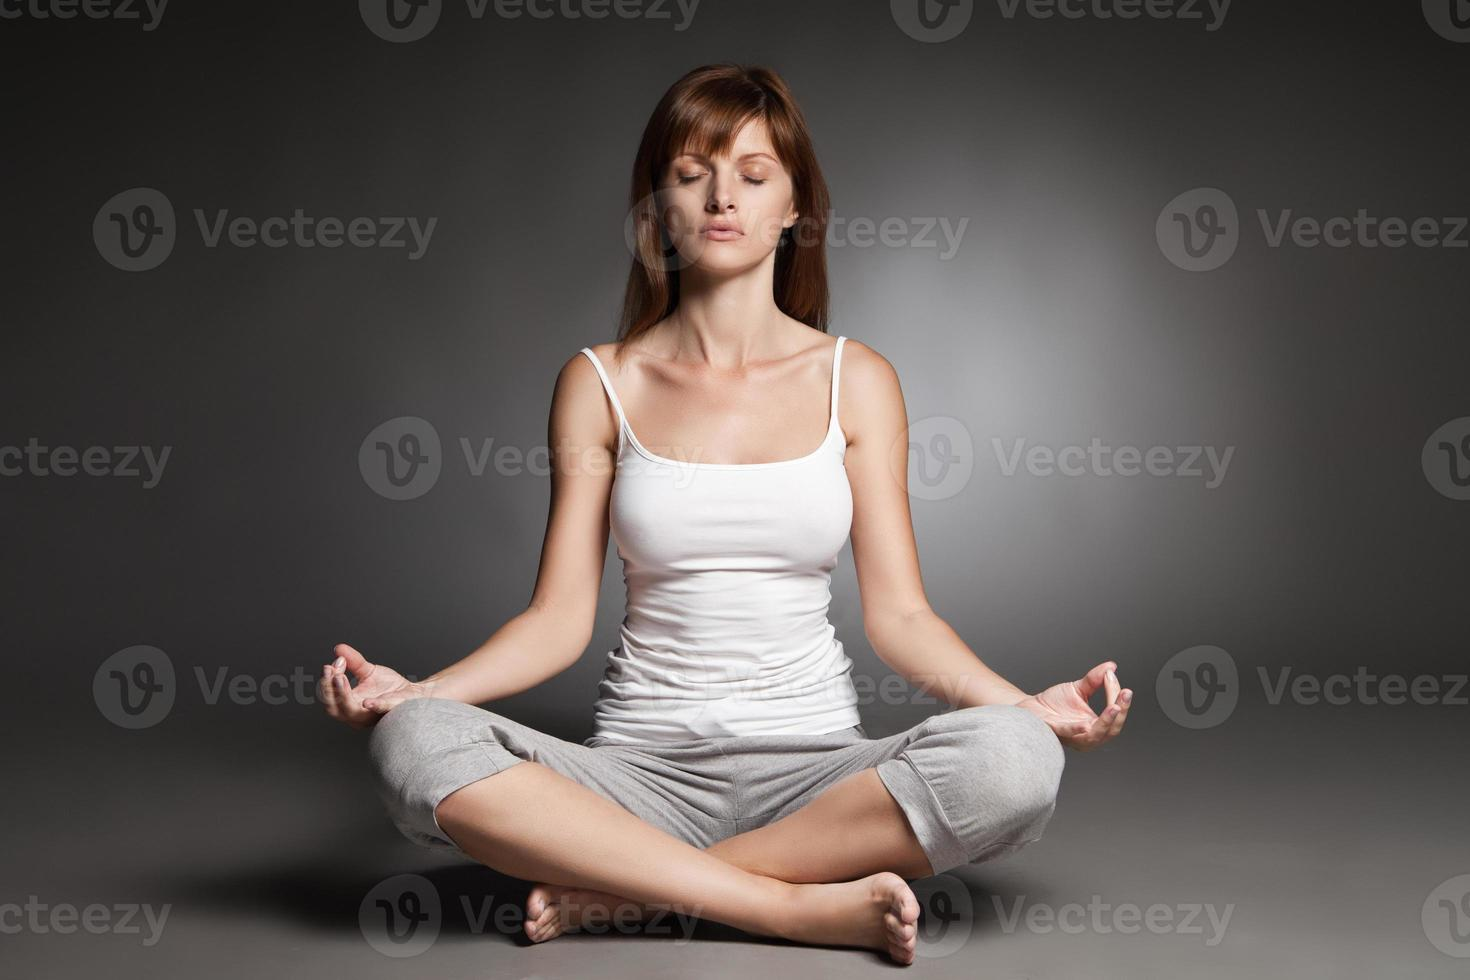 mujer joven haciendo yoga sobre fondo oscuro foto